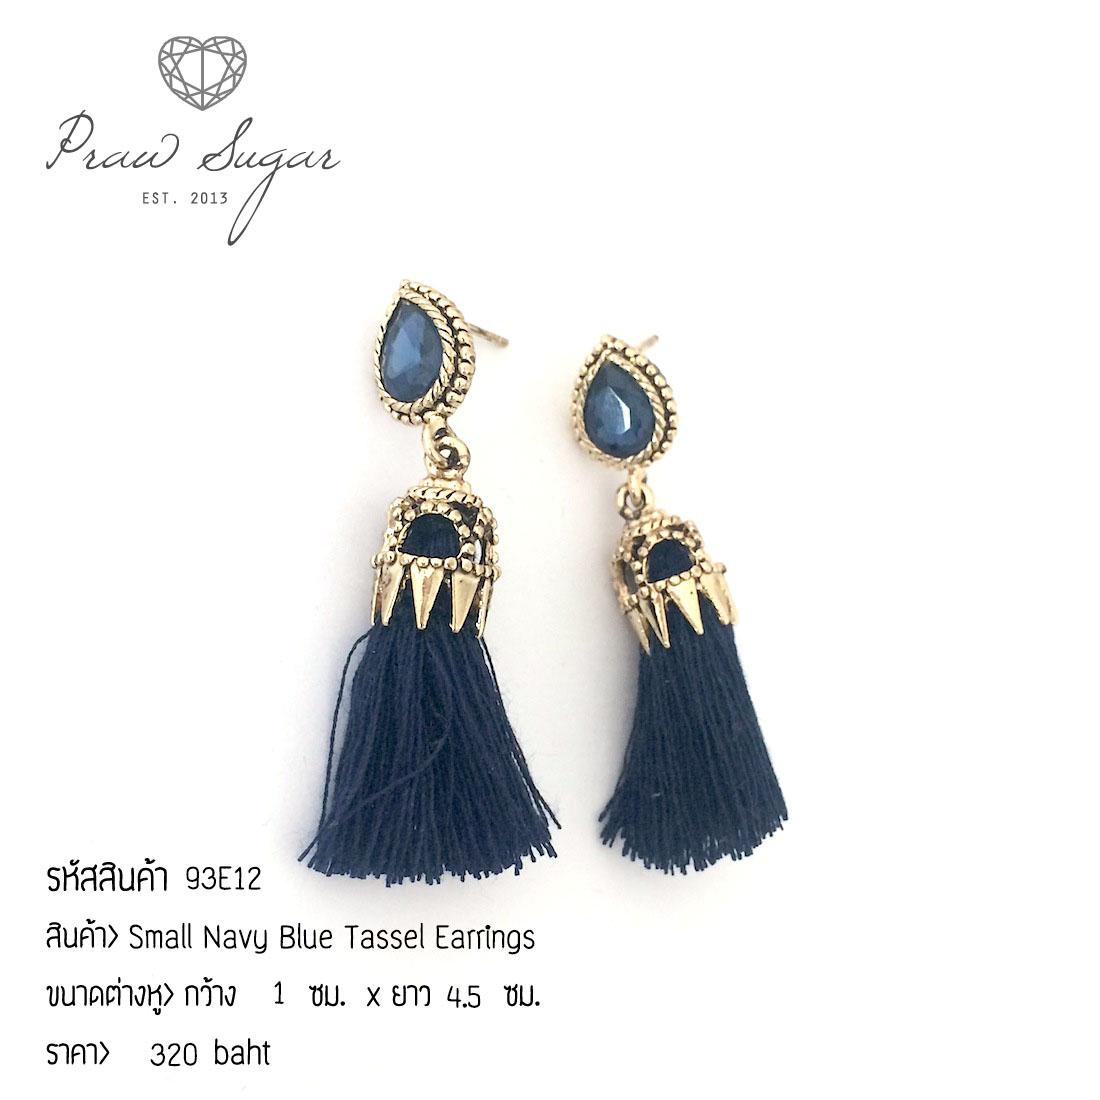 Small Navy Blue Tassel Earrings